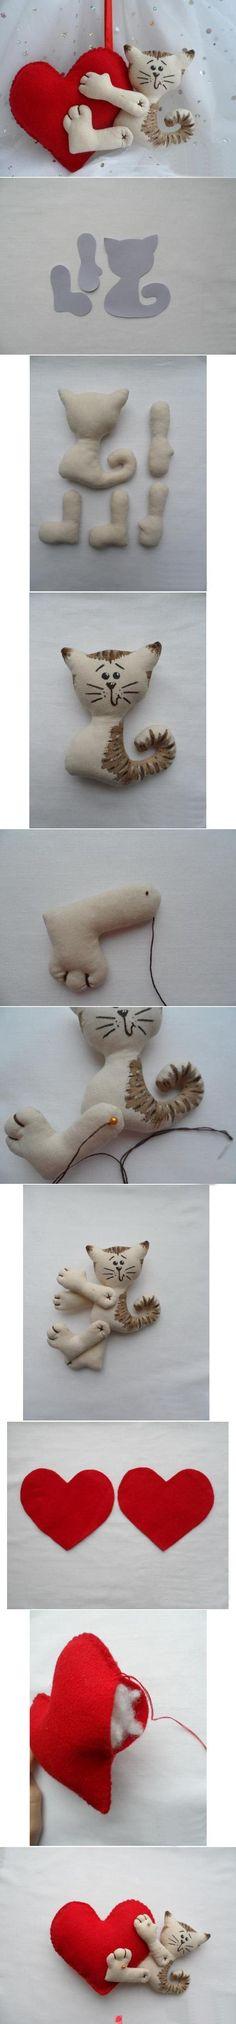 hanging felt cat